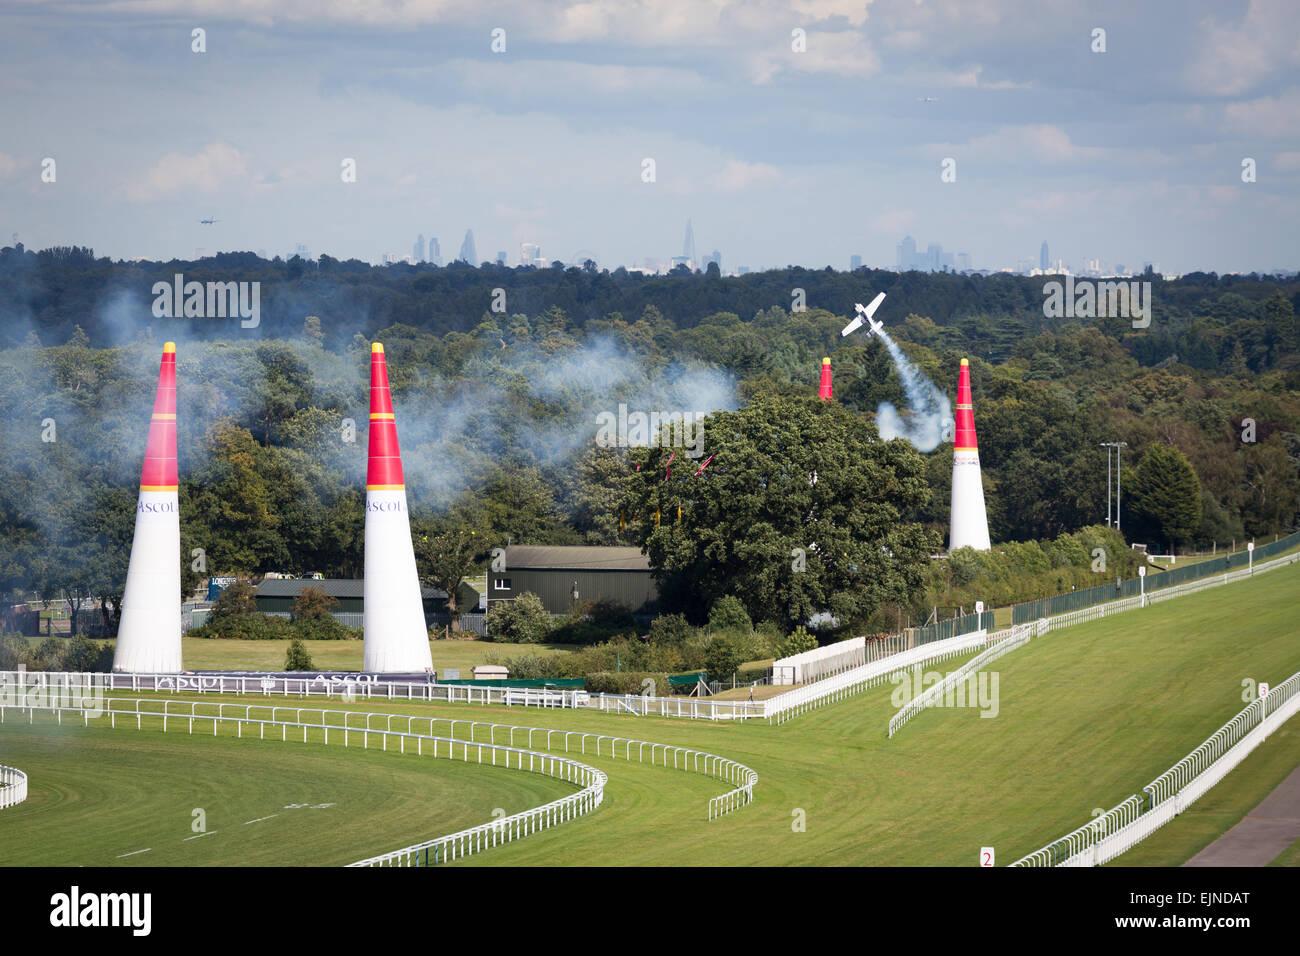 Ascot Racecourse, Berkshire, England, UK  Red Bull Air Race